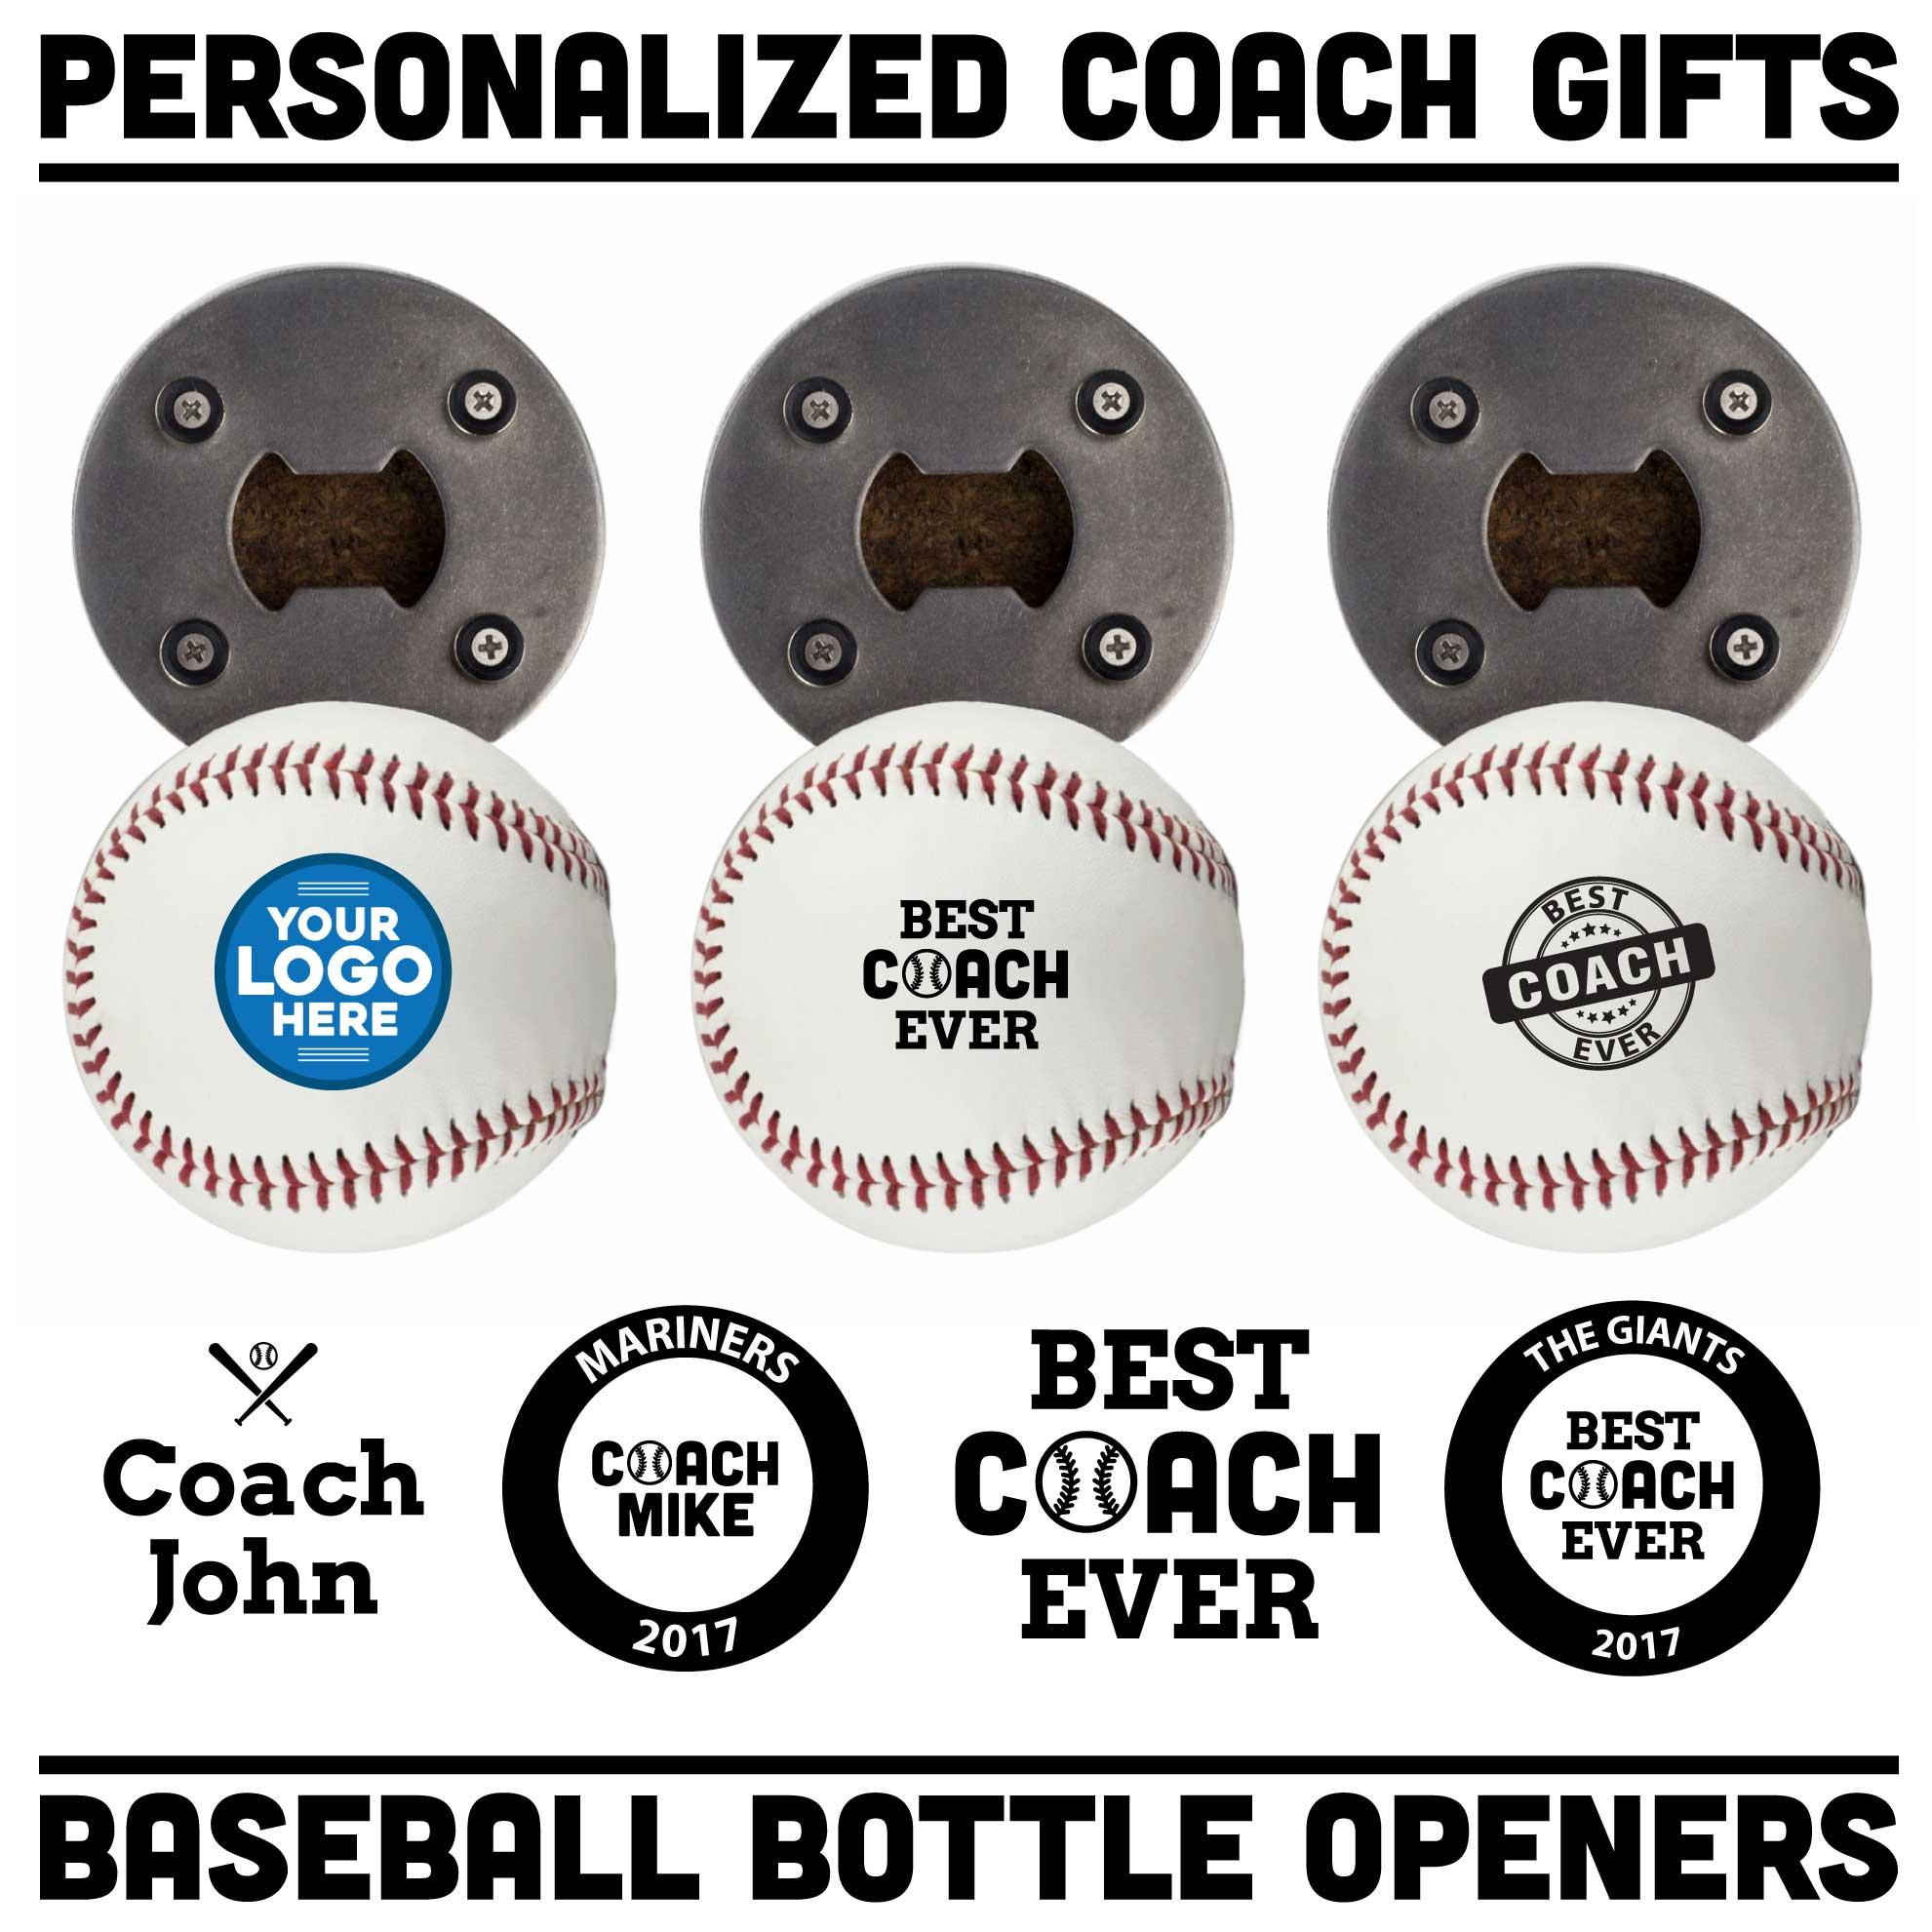 BaseballOpener-Coaches-Gift-Ad